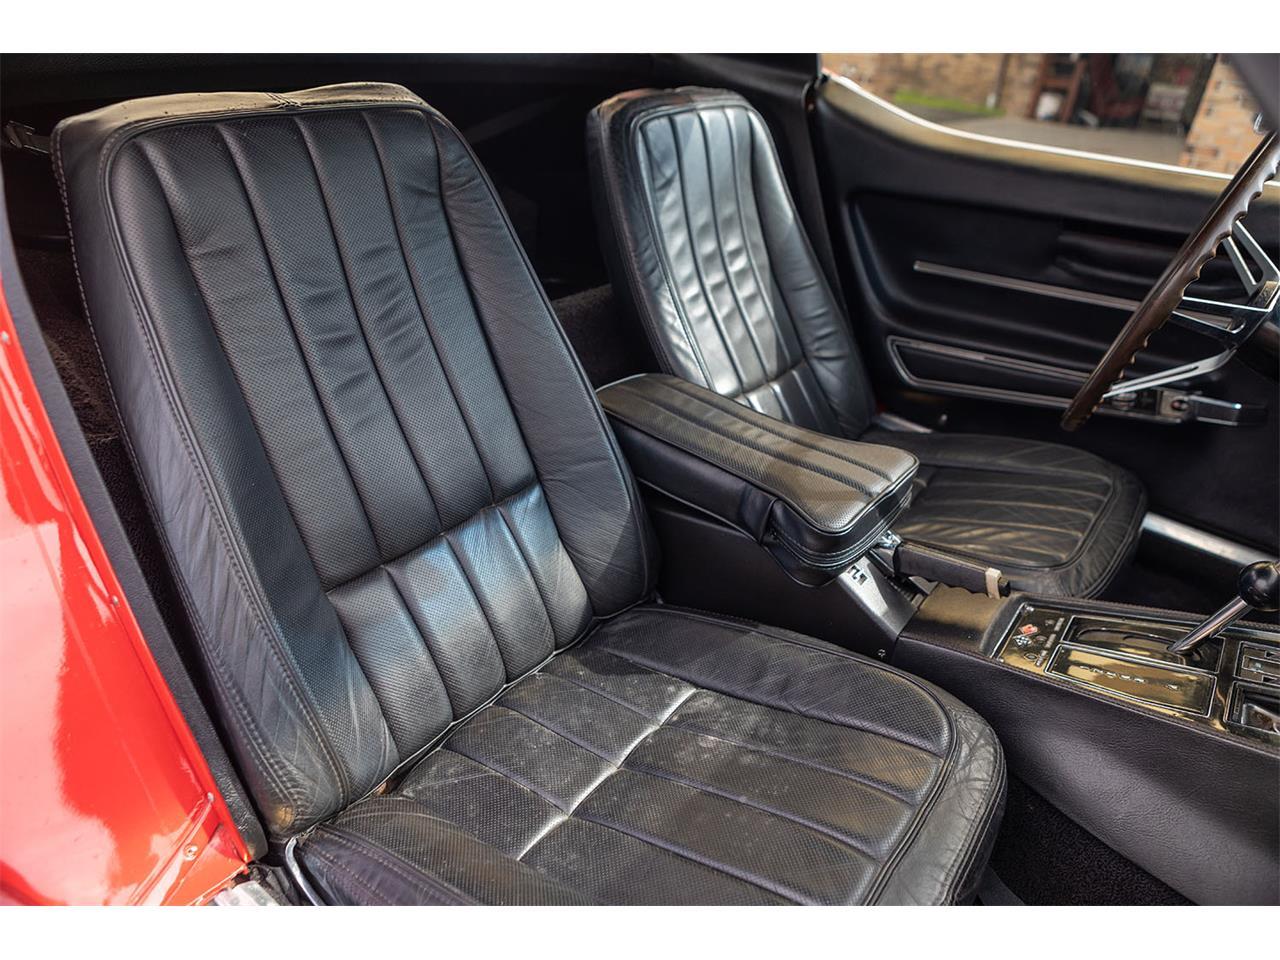 1968 Chevrolet Corvette (CC-1225564) for sale in Dongola, Illinois